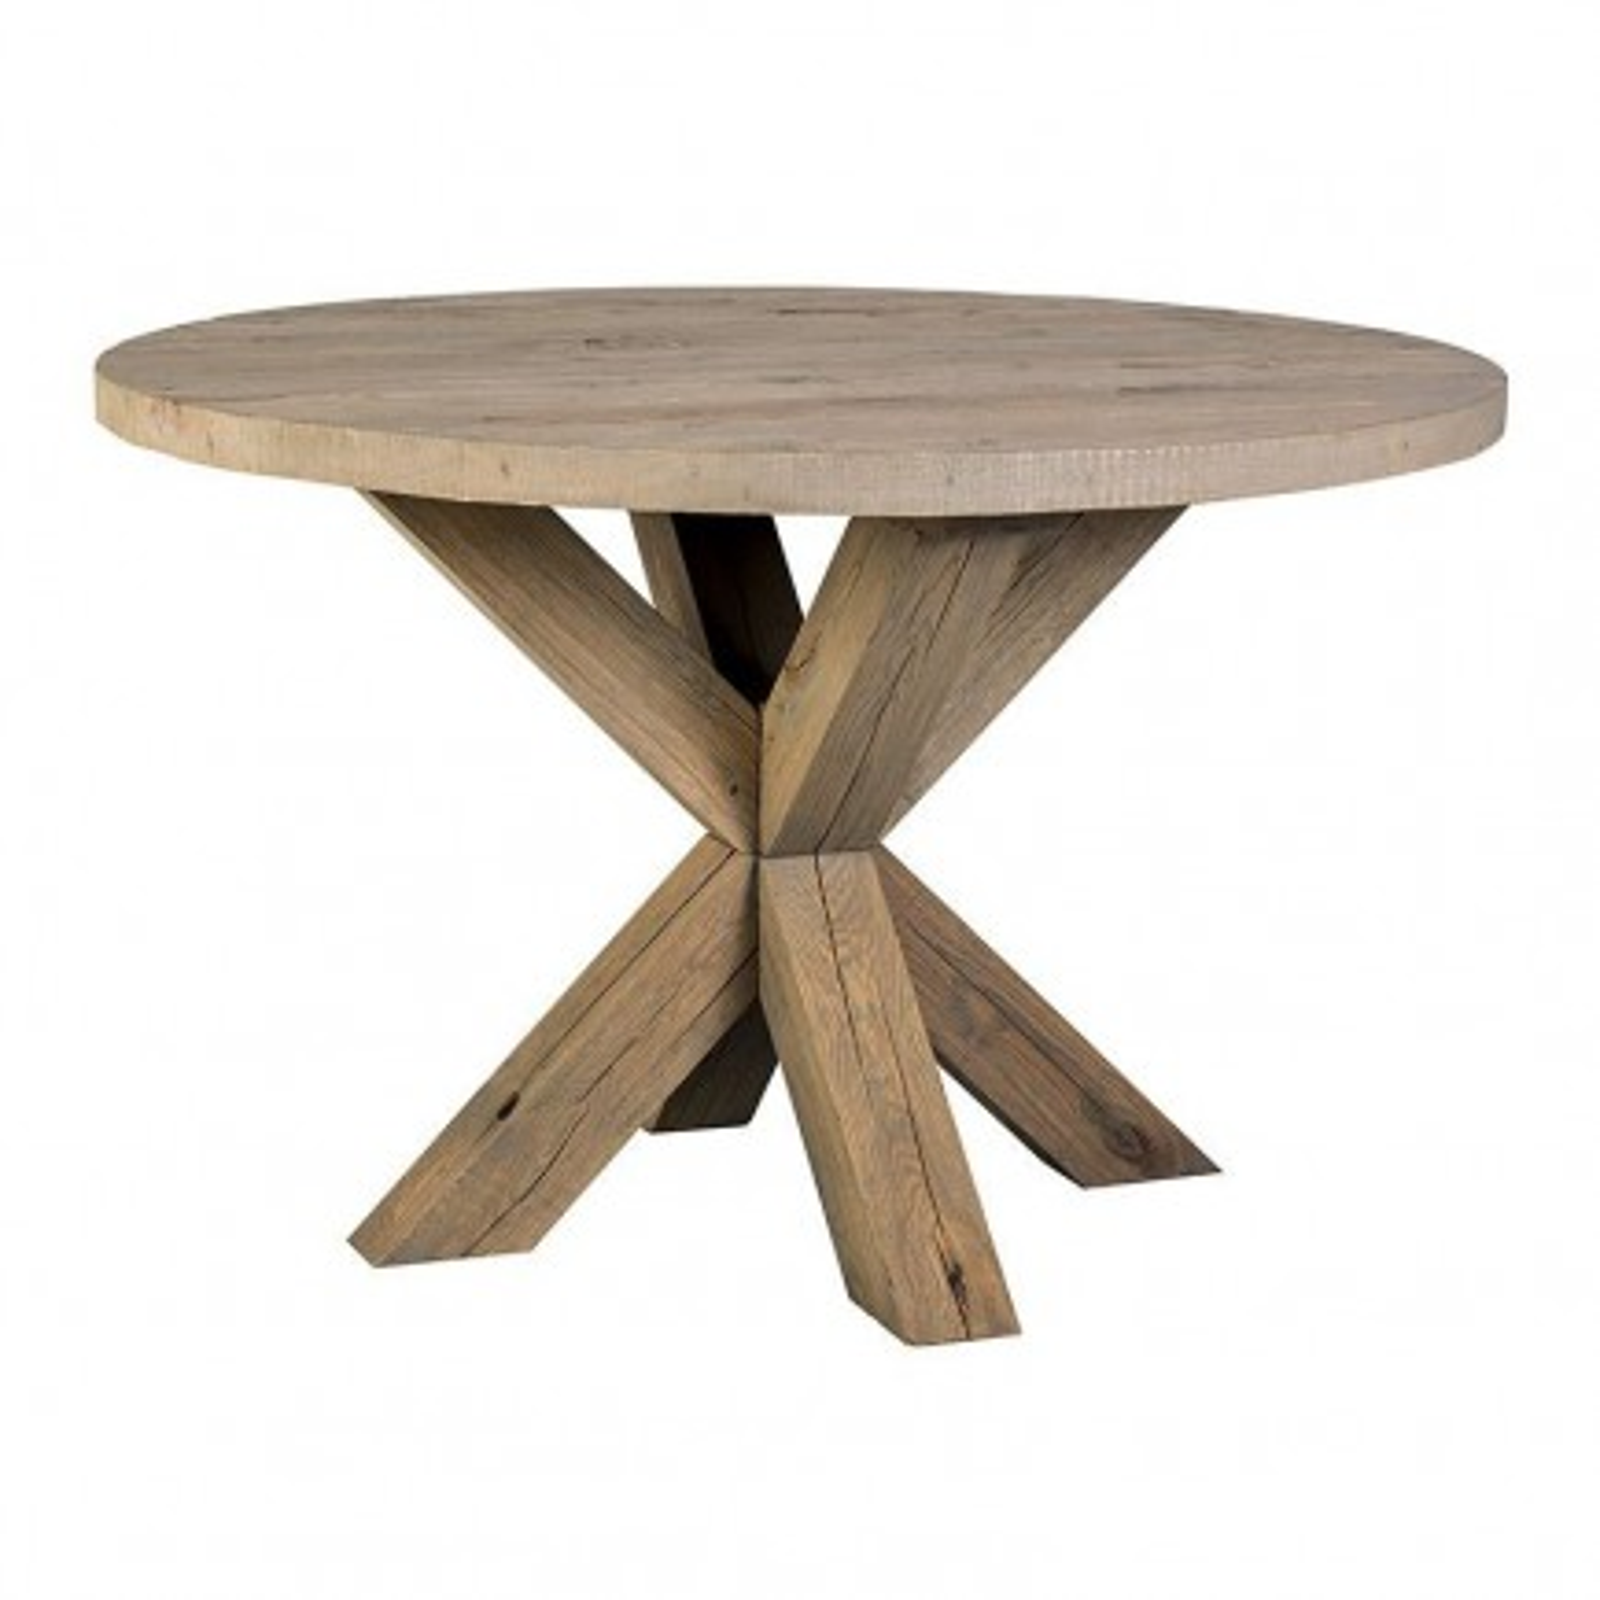 Table de salle ronde Camarat Victoria Chêne - meuble style campagne